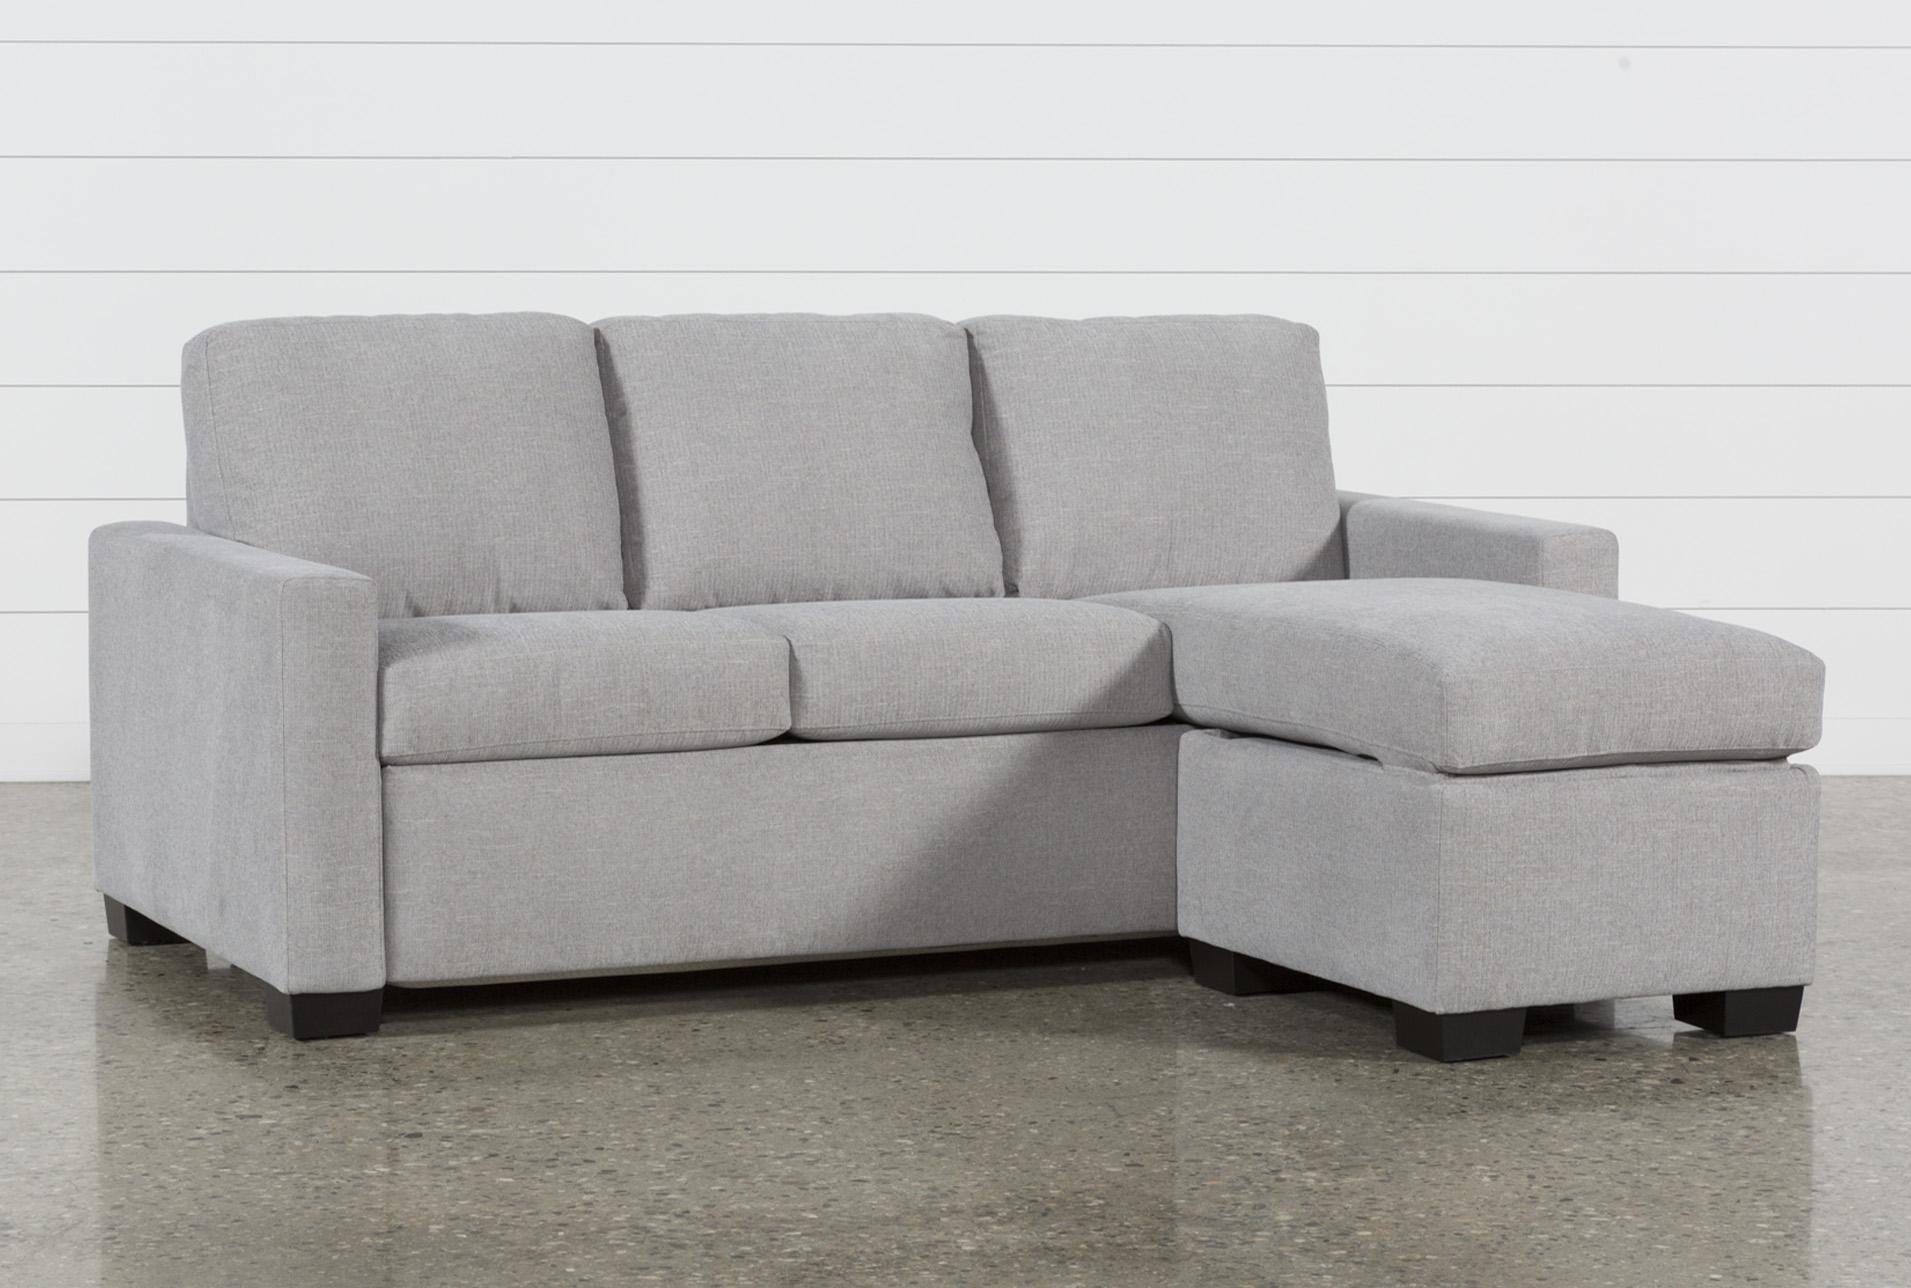 mackenzie silverpine queen plus sofa sleeper w storage chaise rh livingspaces com Living Spaces Outlet Store living spaces sofa bed sectional